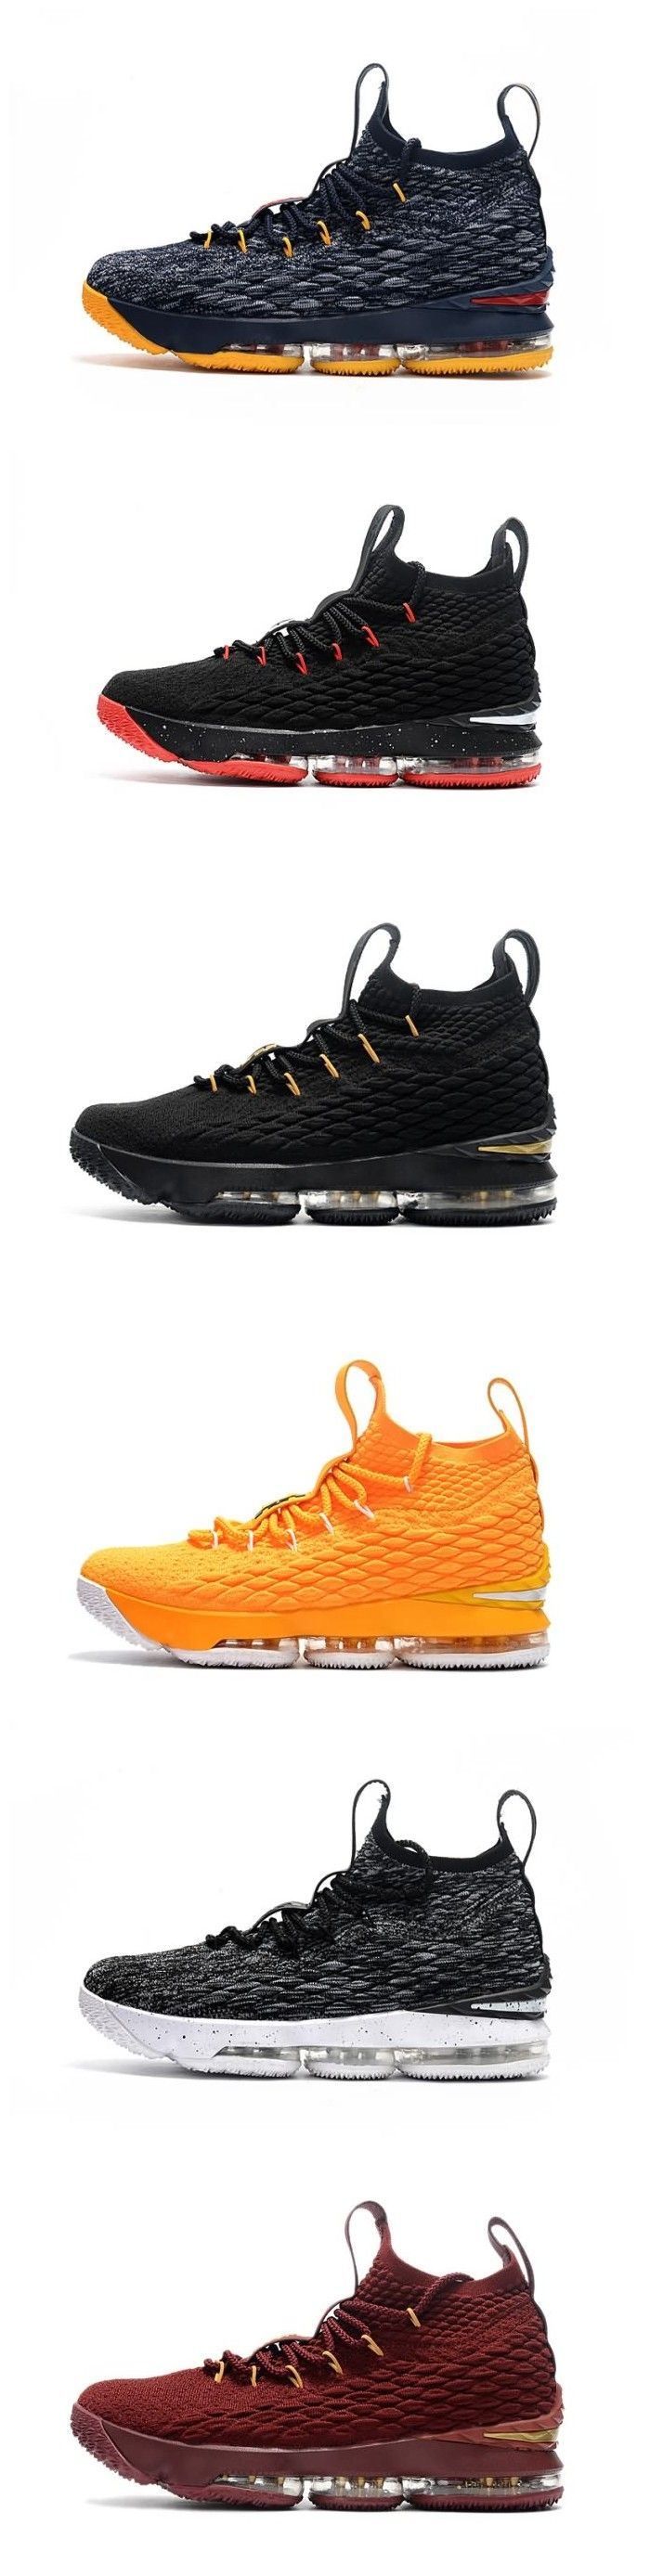 e82645f11e968 cheap nike lebron shoes for women 84626 2077a